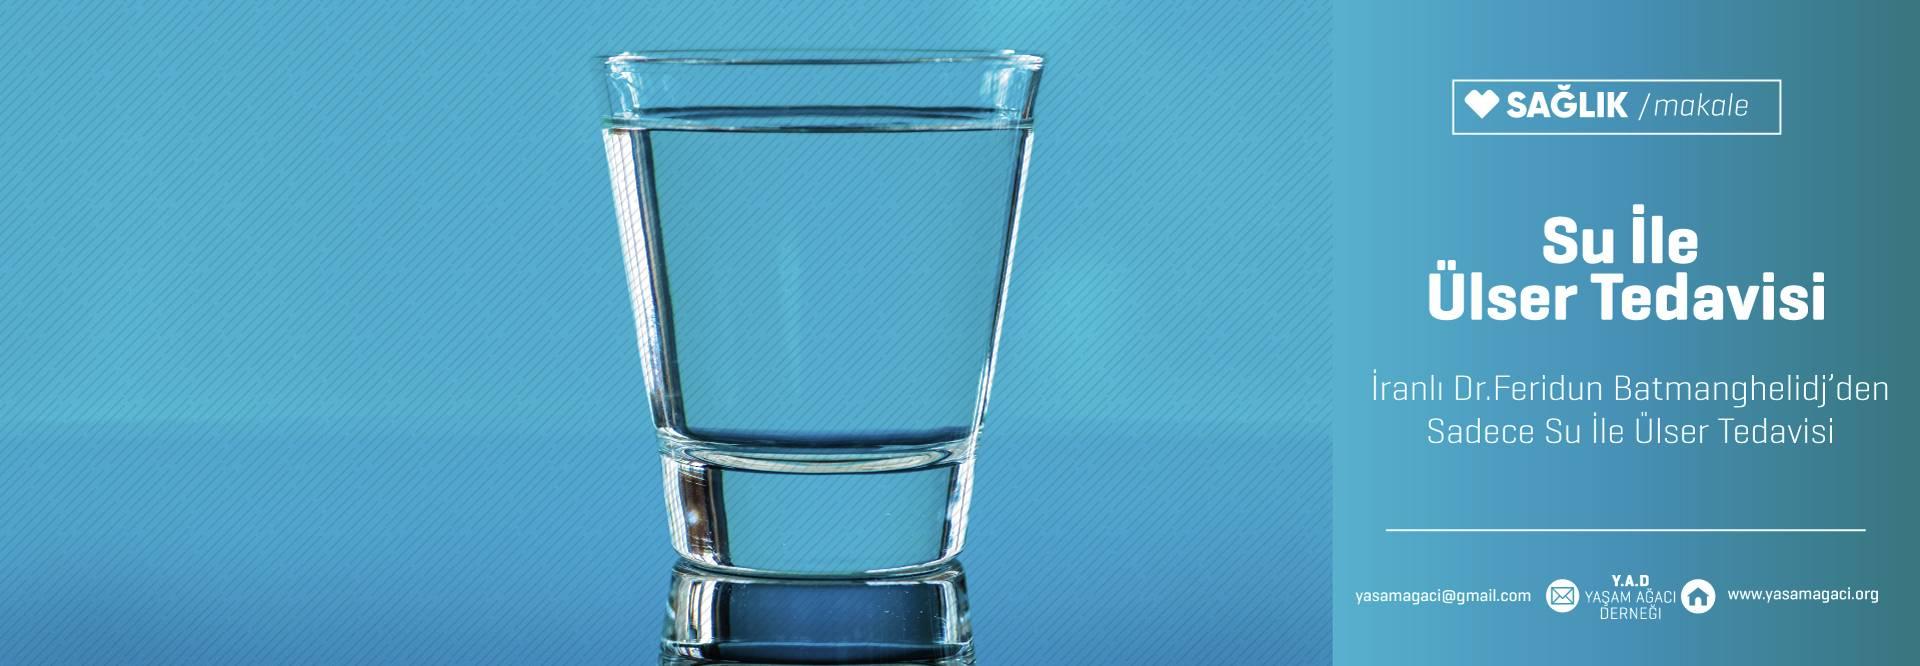 Su İle Ülser Tedavisi